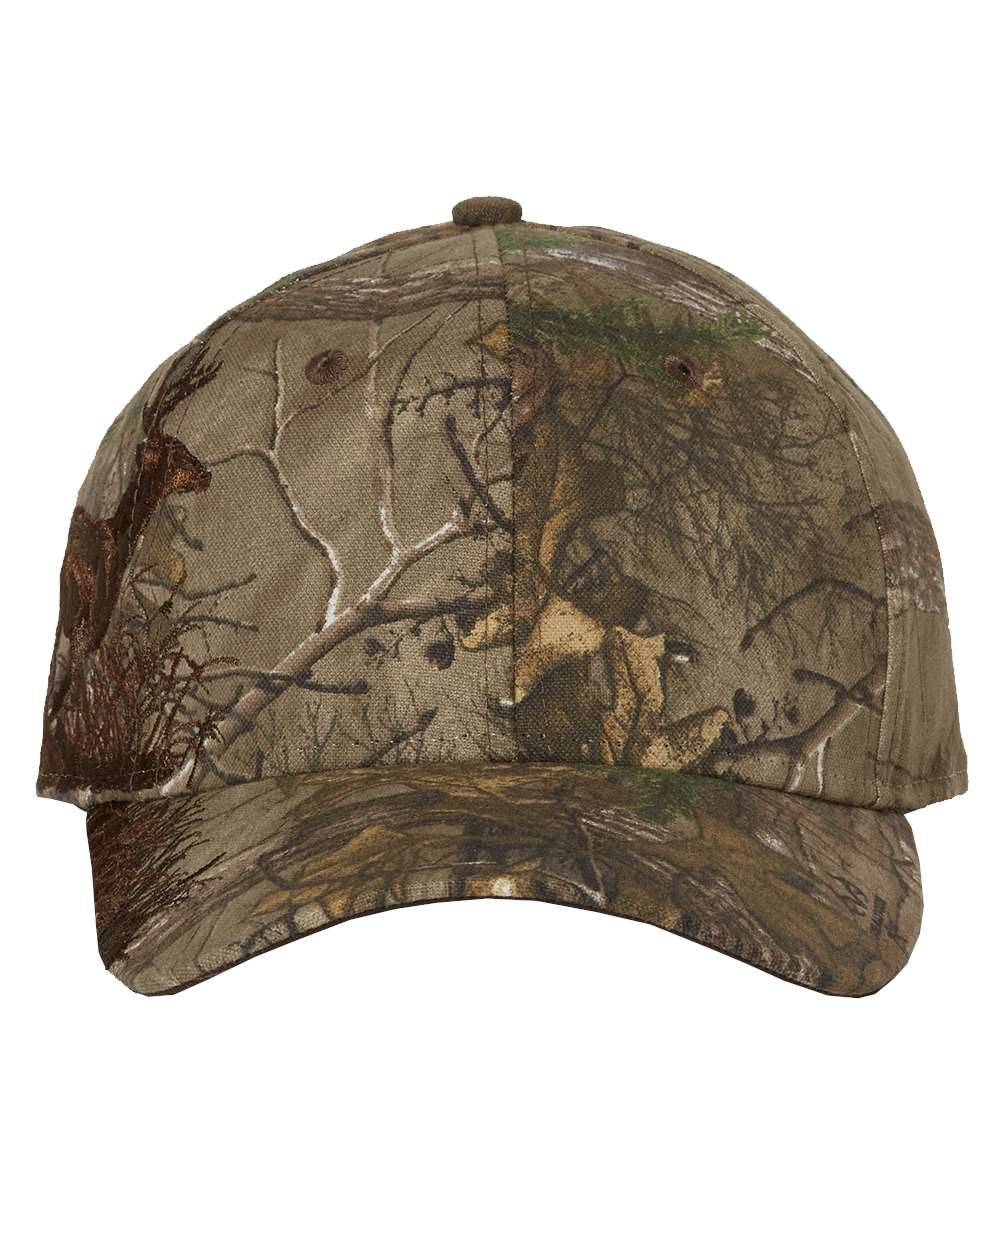 DRI DUCK - Running Buck Cap - 3301 - Realtree Xtra - Adjustable - One Size